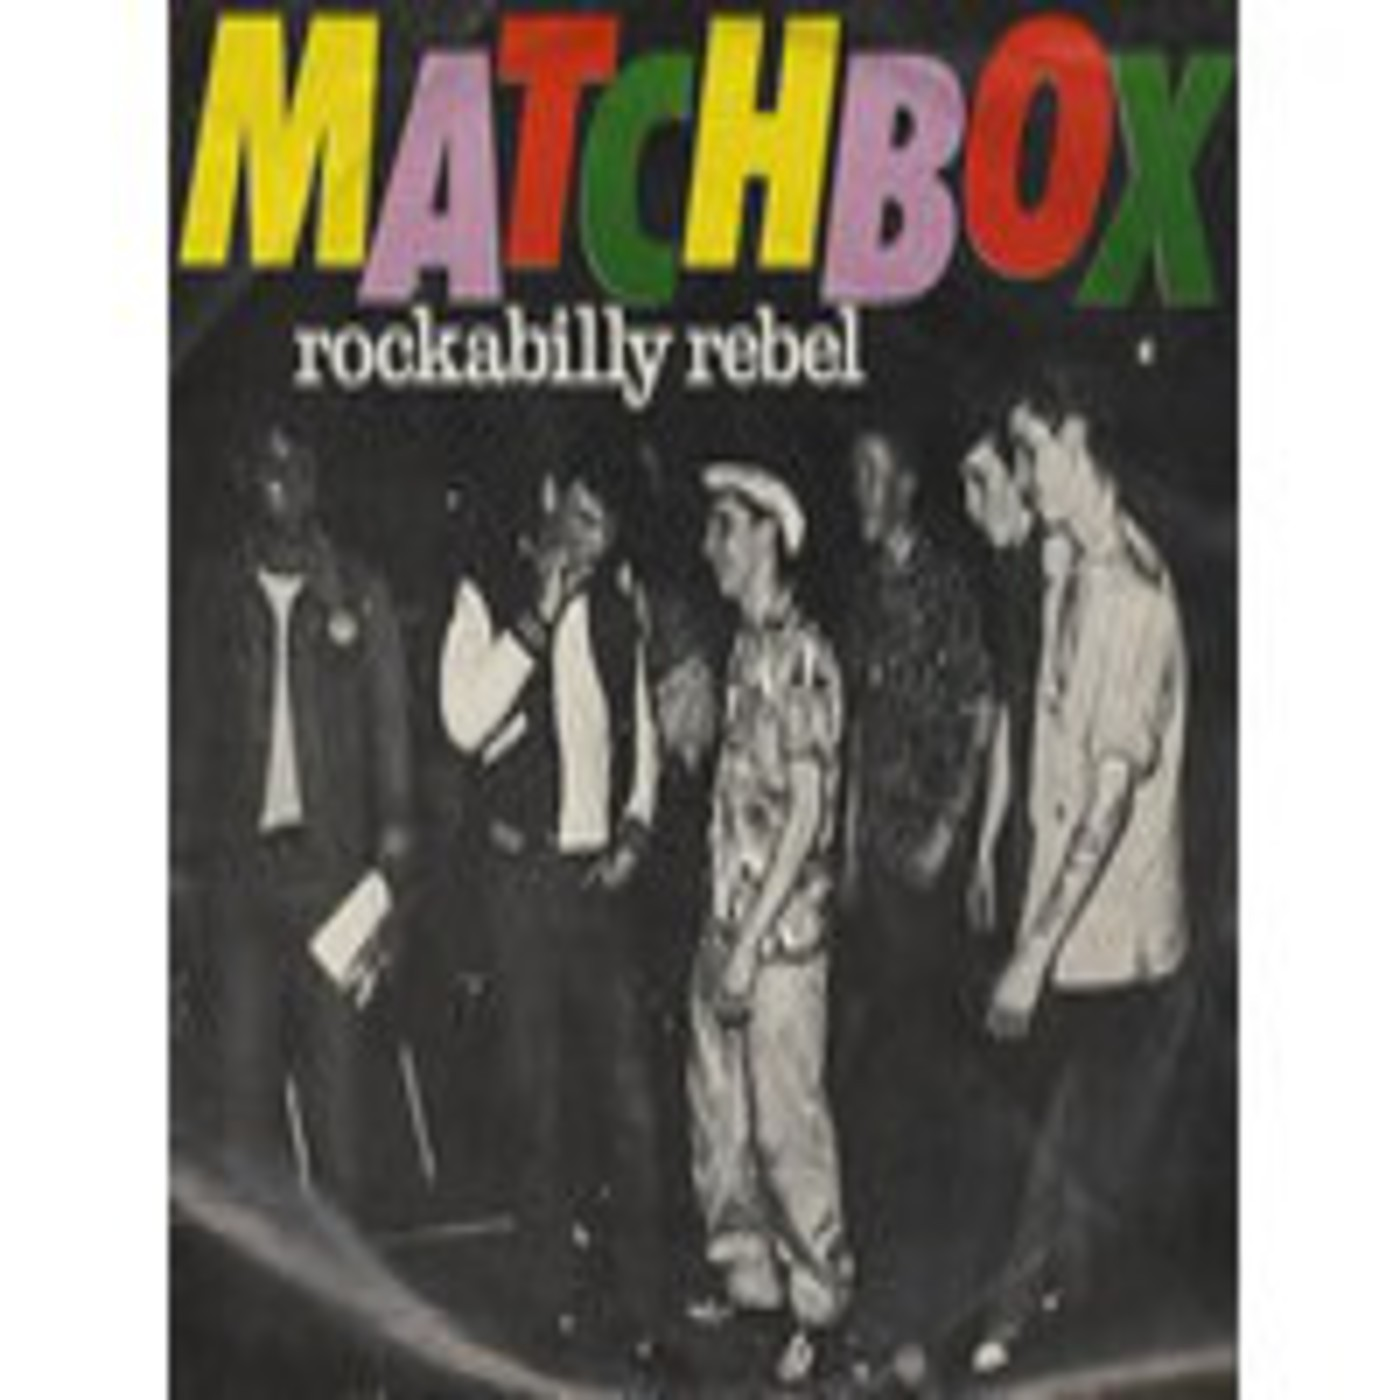 Matchbox - Rockabilly Rebeld (Single 1979)